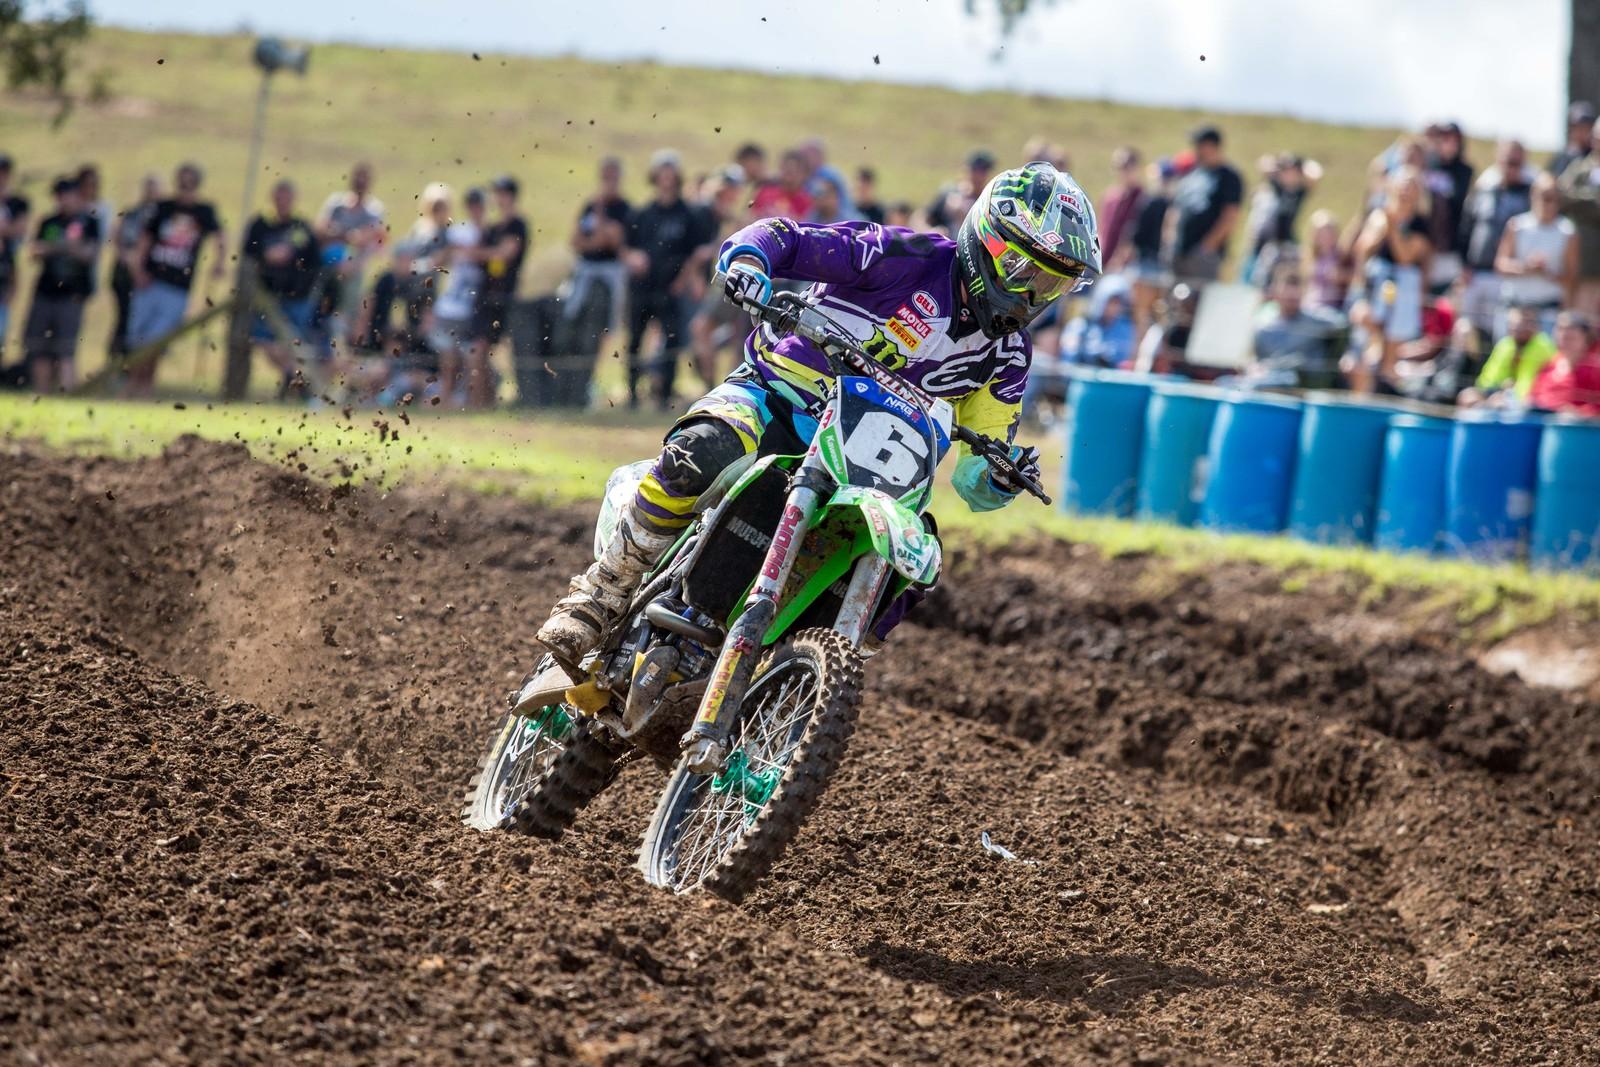 Jake Moss - Australian Motul Motocross Nationals Round 2, Appin - Motocross Pictures - Vital MX